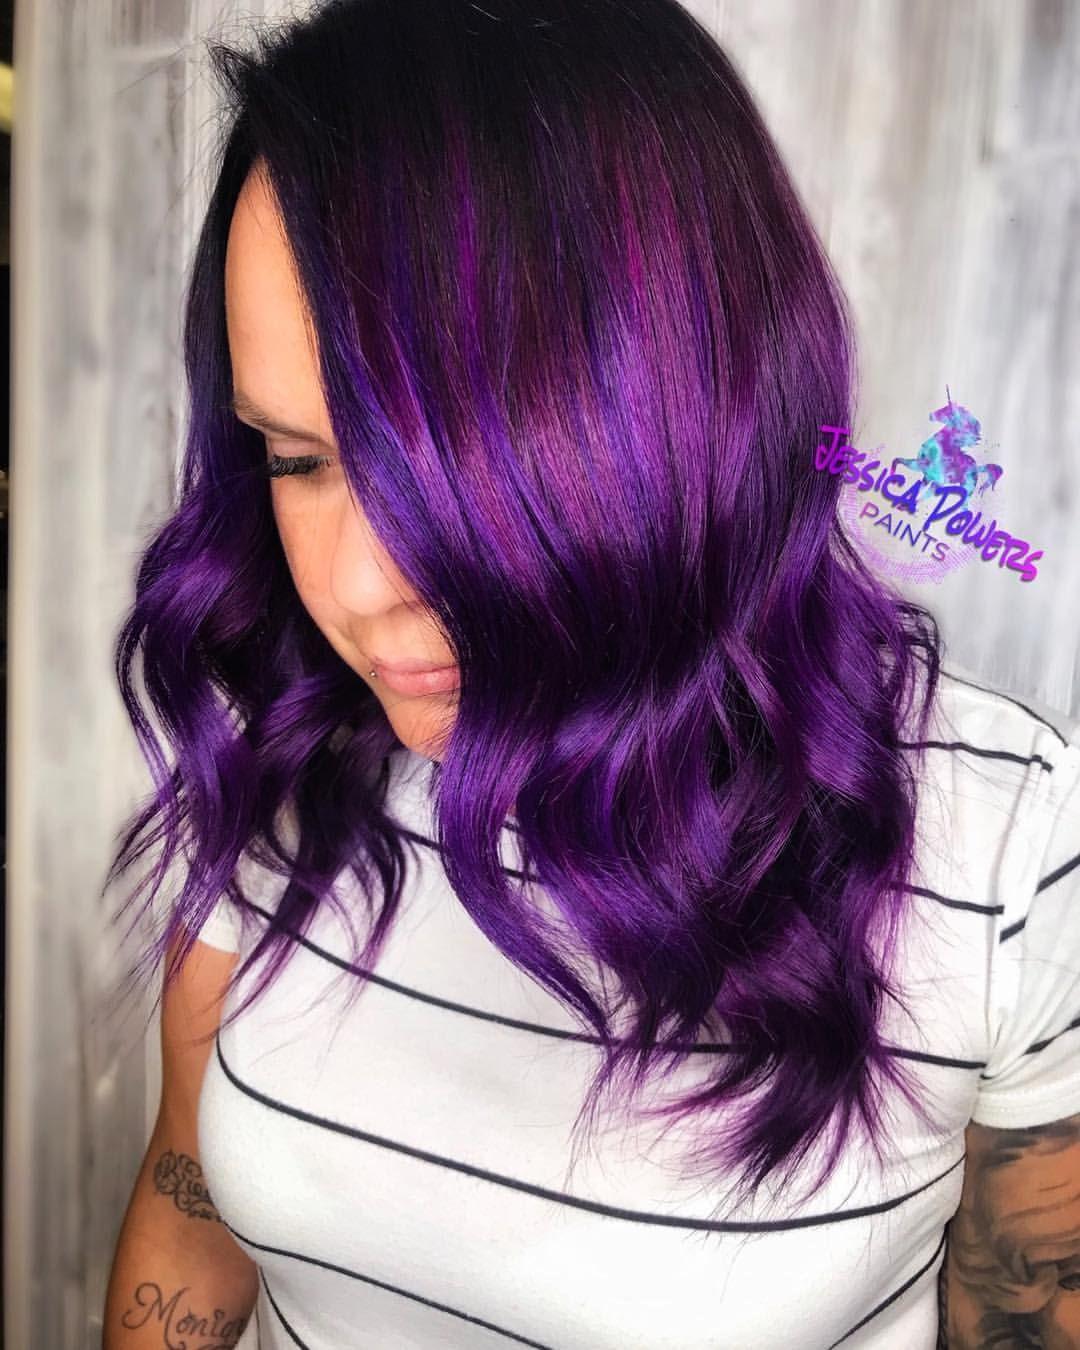 Pink and purple hair color vibrant vivid fashion on dark ...